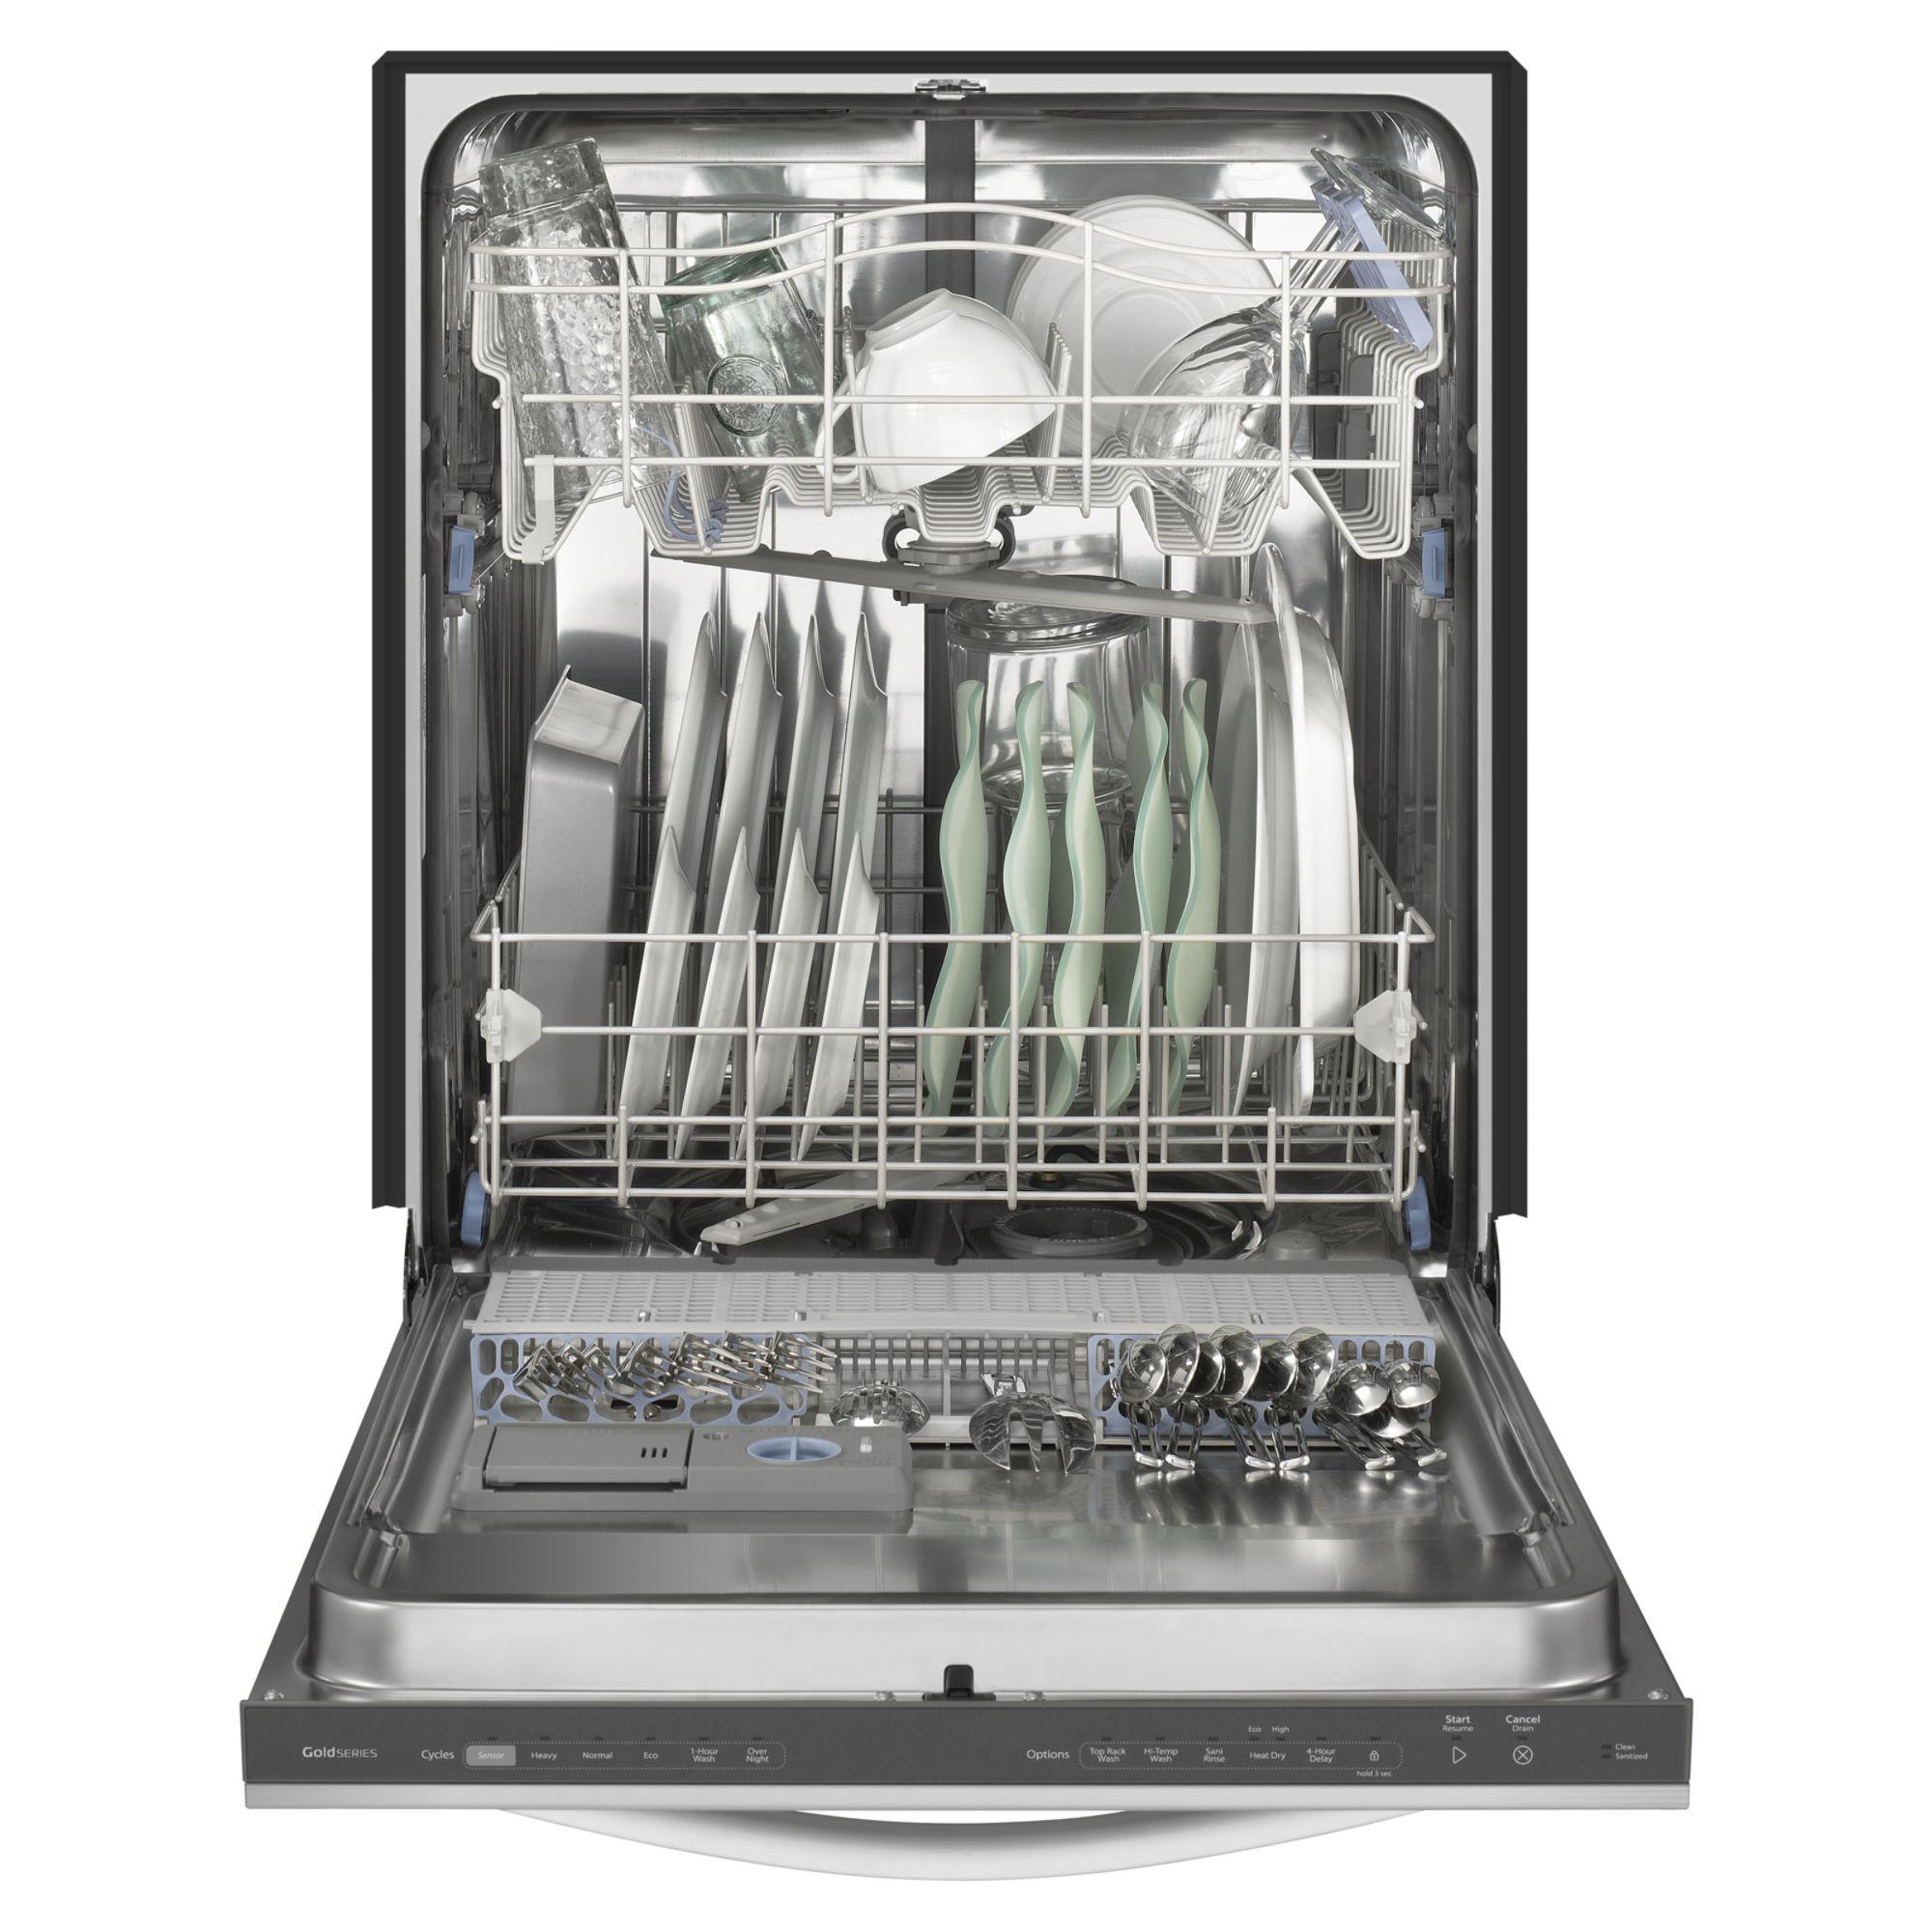 "Whirlpool 24"" Built-In Dishwasher w/ Top Rack Wash Option - Black"